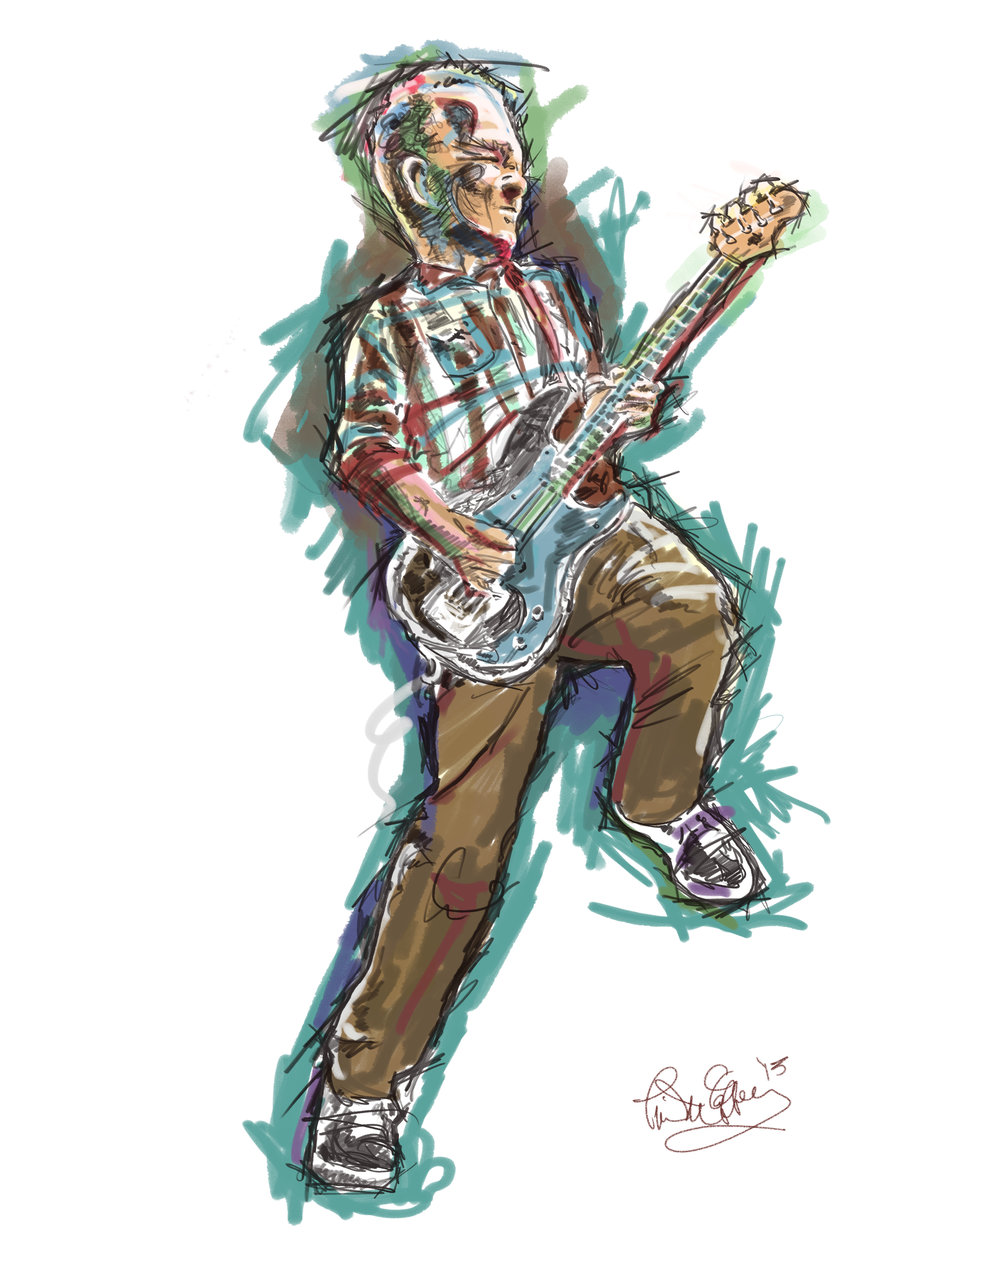 Scott Thunes - Frank Zappa - The Mother Hips